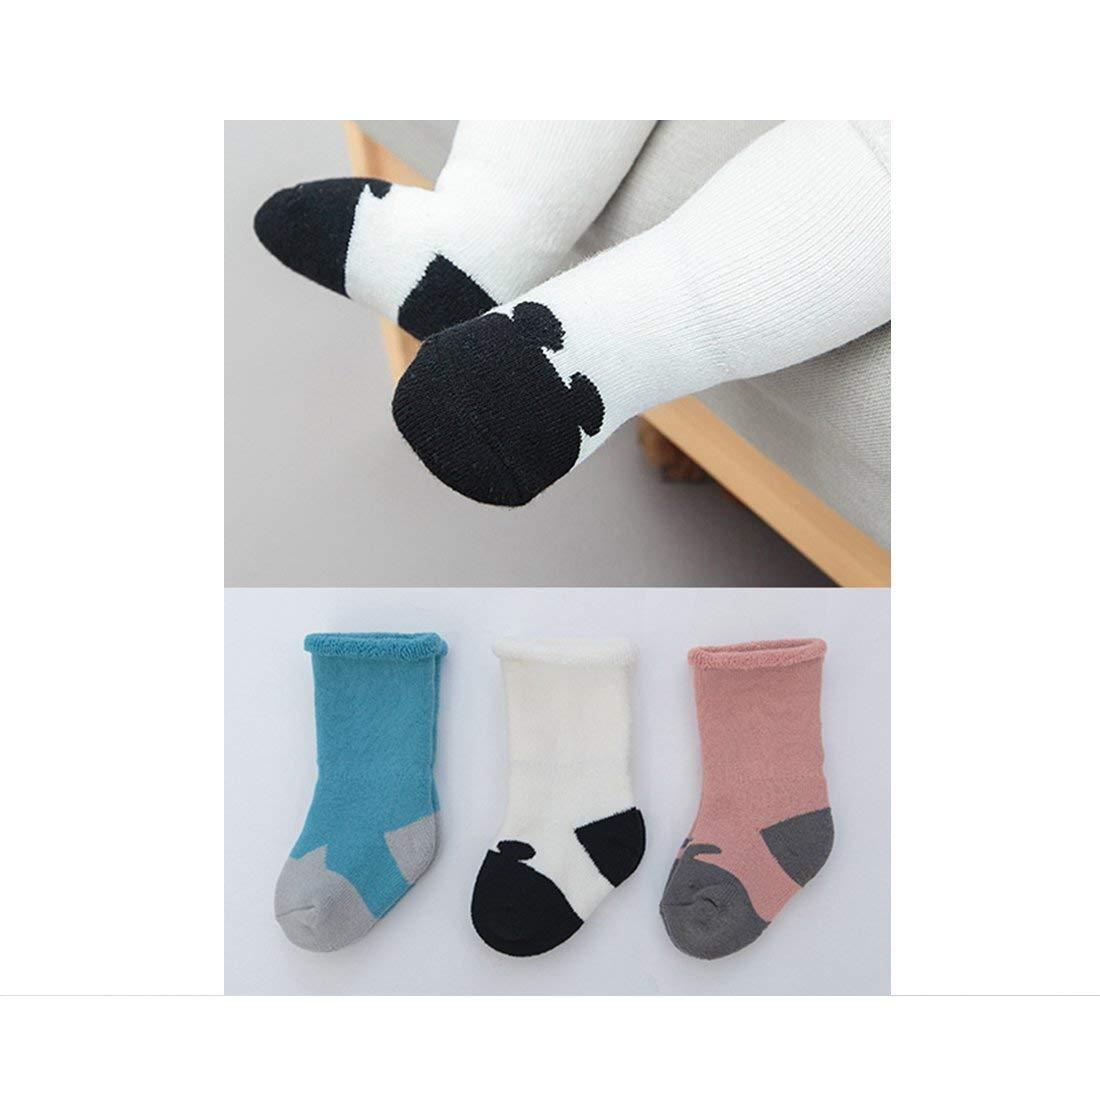 Fun /& Cute baby socks Soft Cotton Fabric 3 Pairs Delicate Workmanship